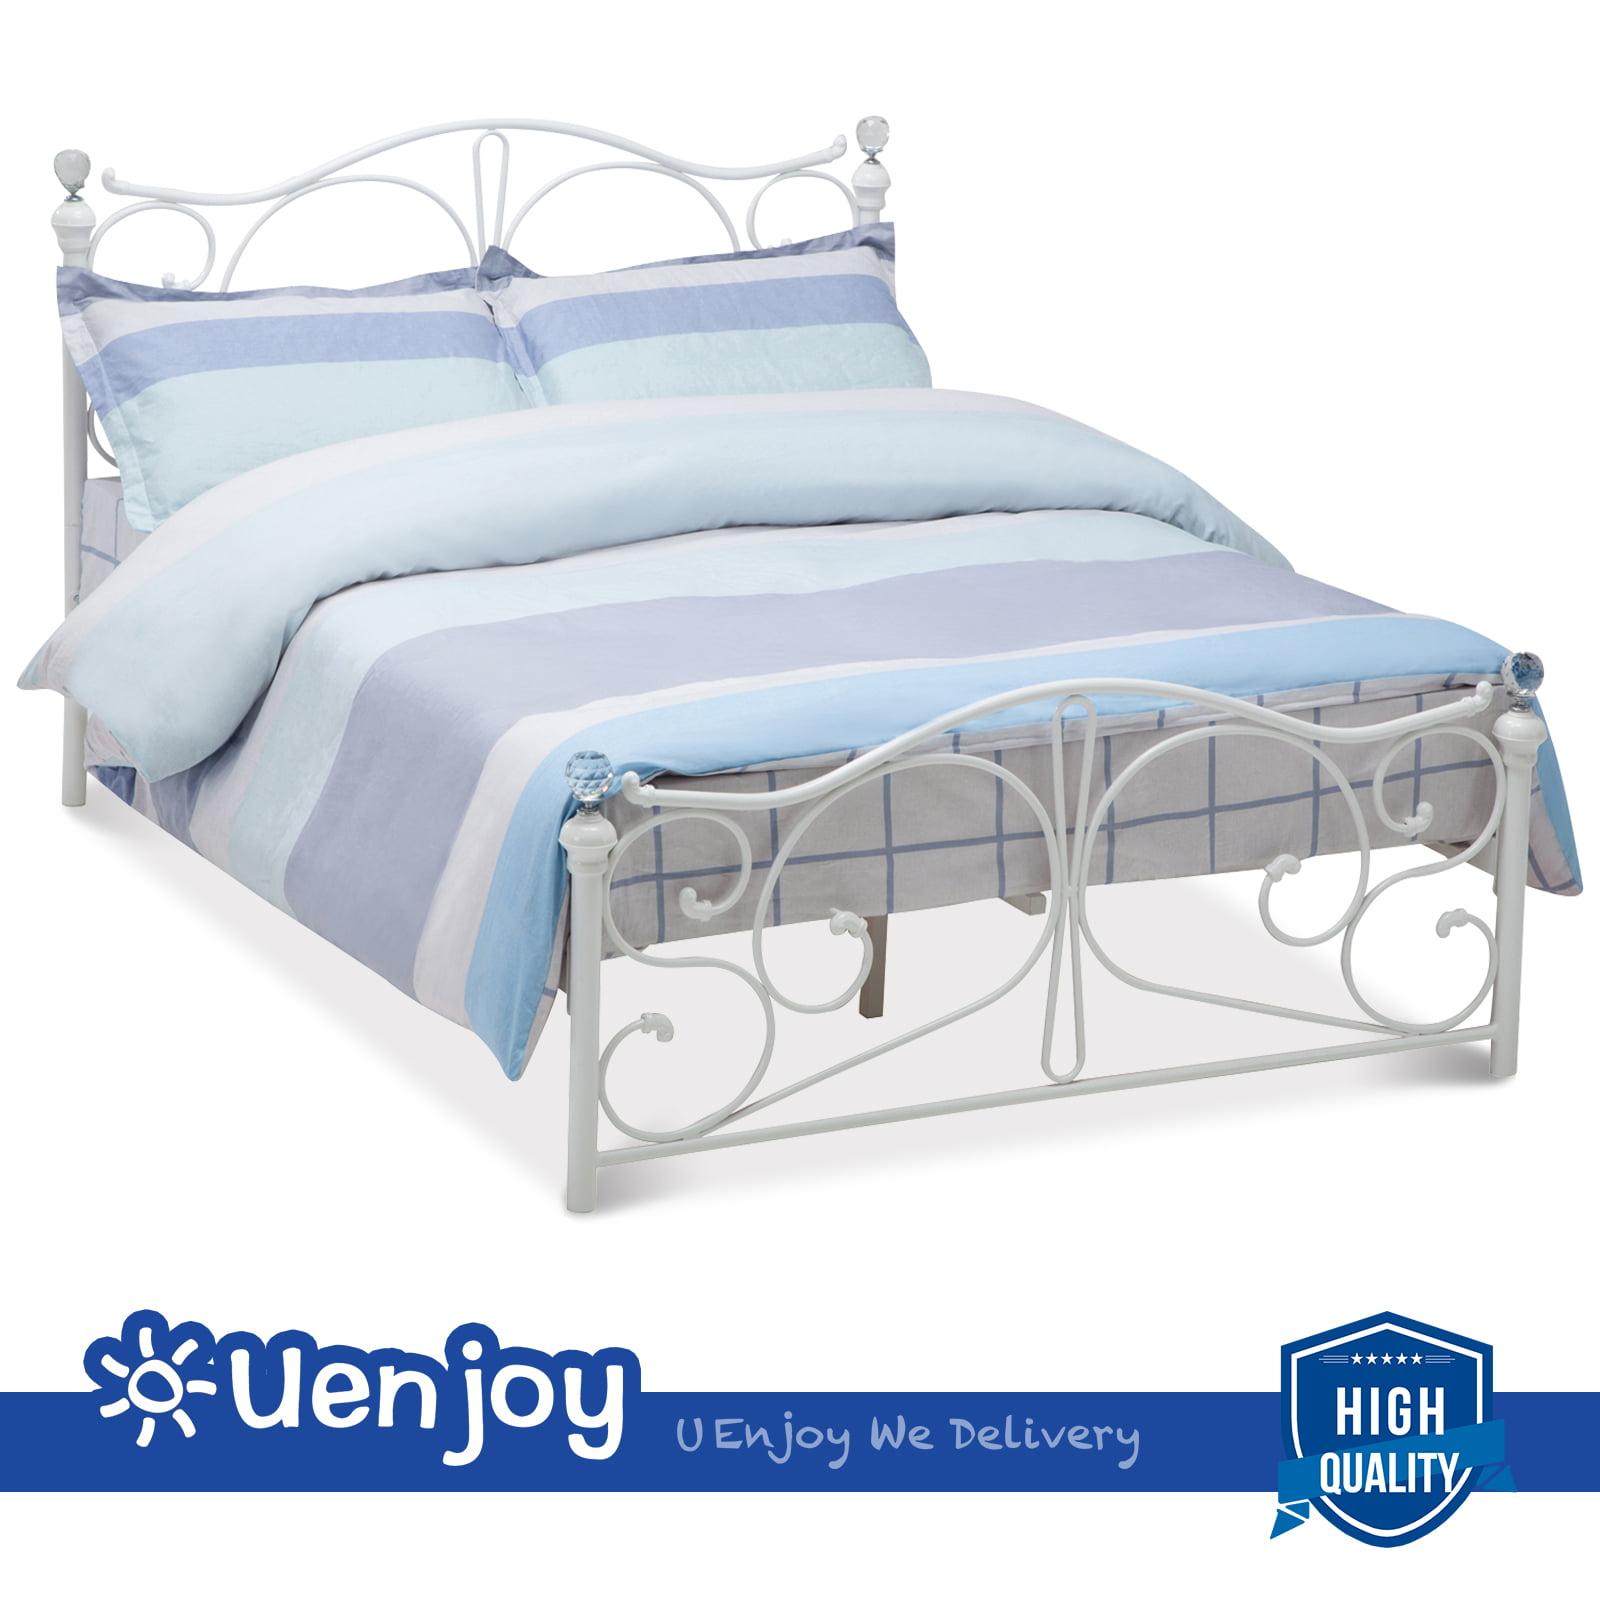 Uenjoy Full Size Metal Bed Frame Bright pearl Finial Headboard Footboard, White by Uenjoy